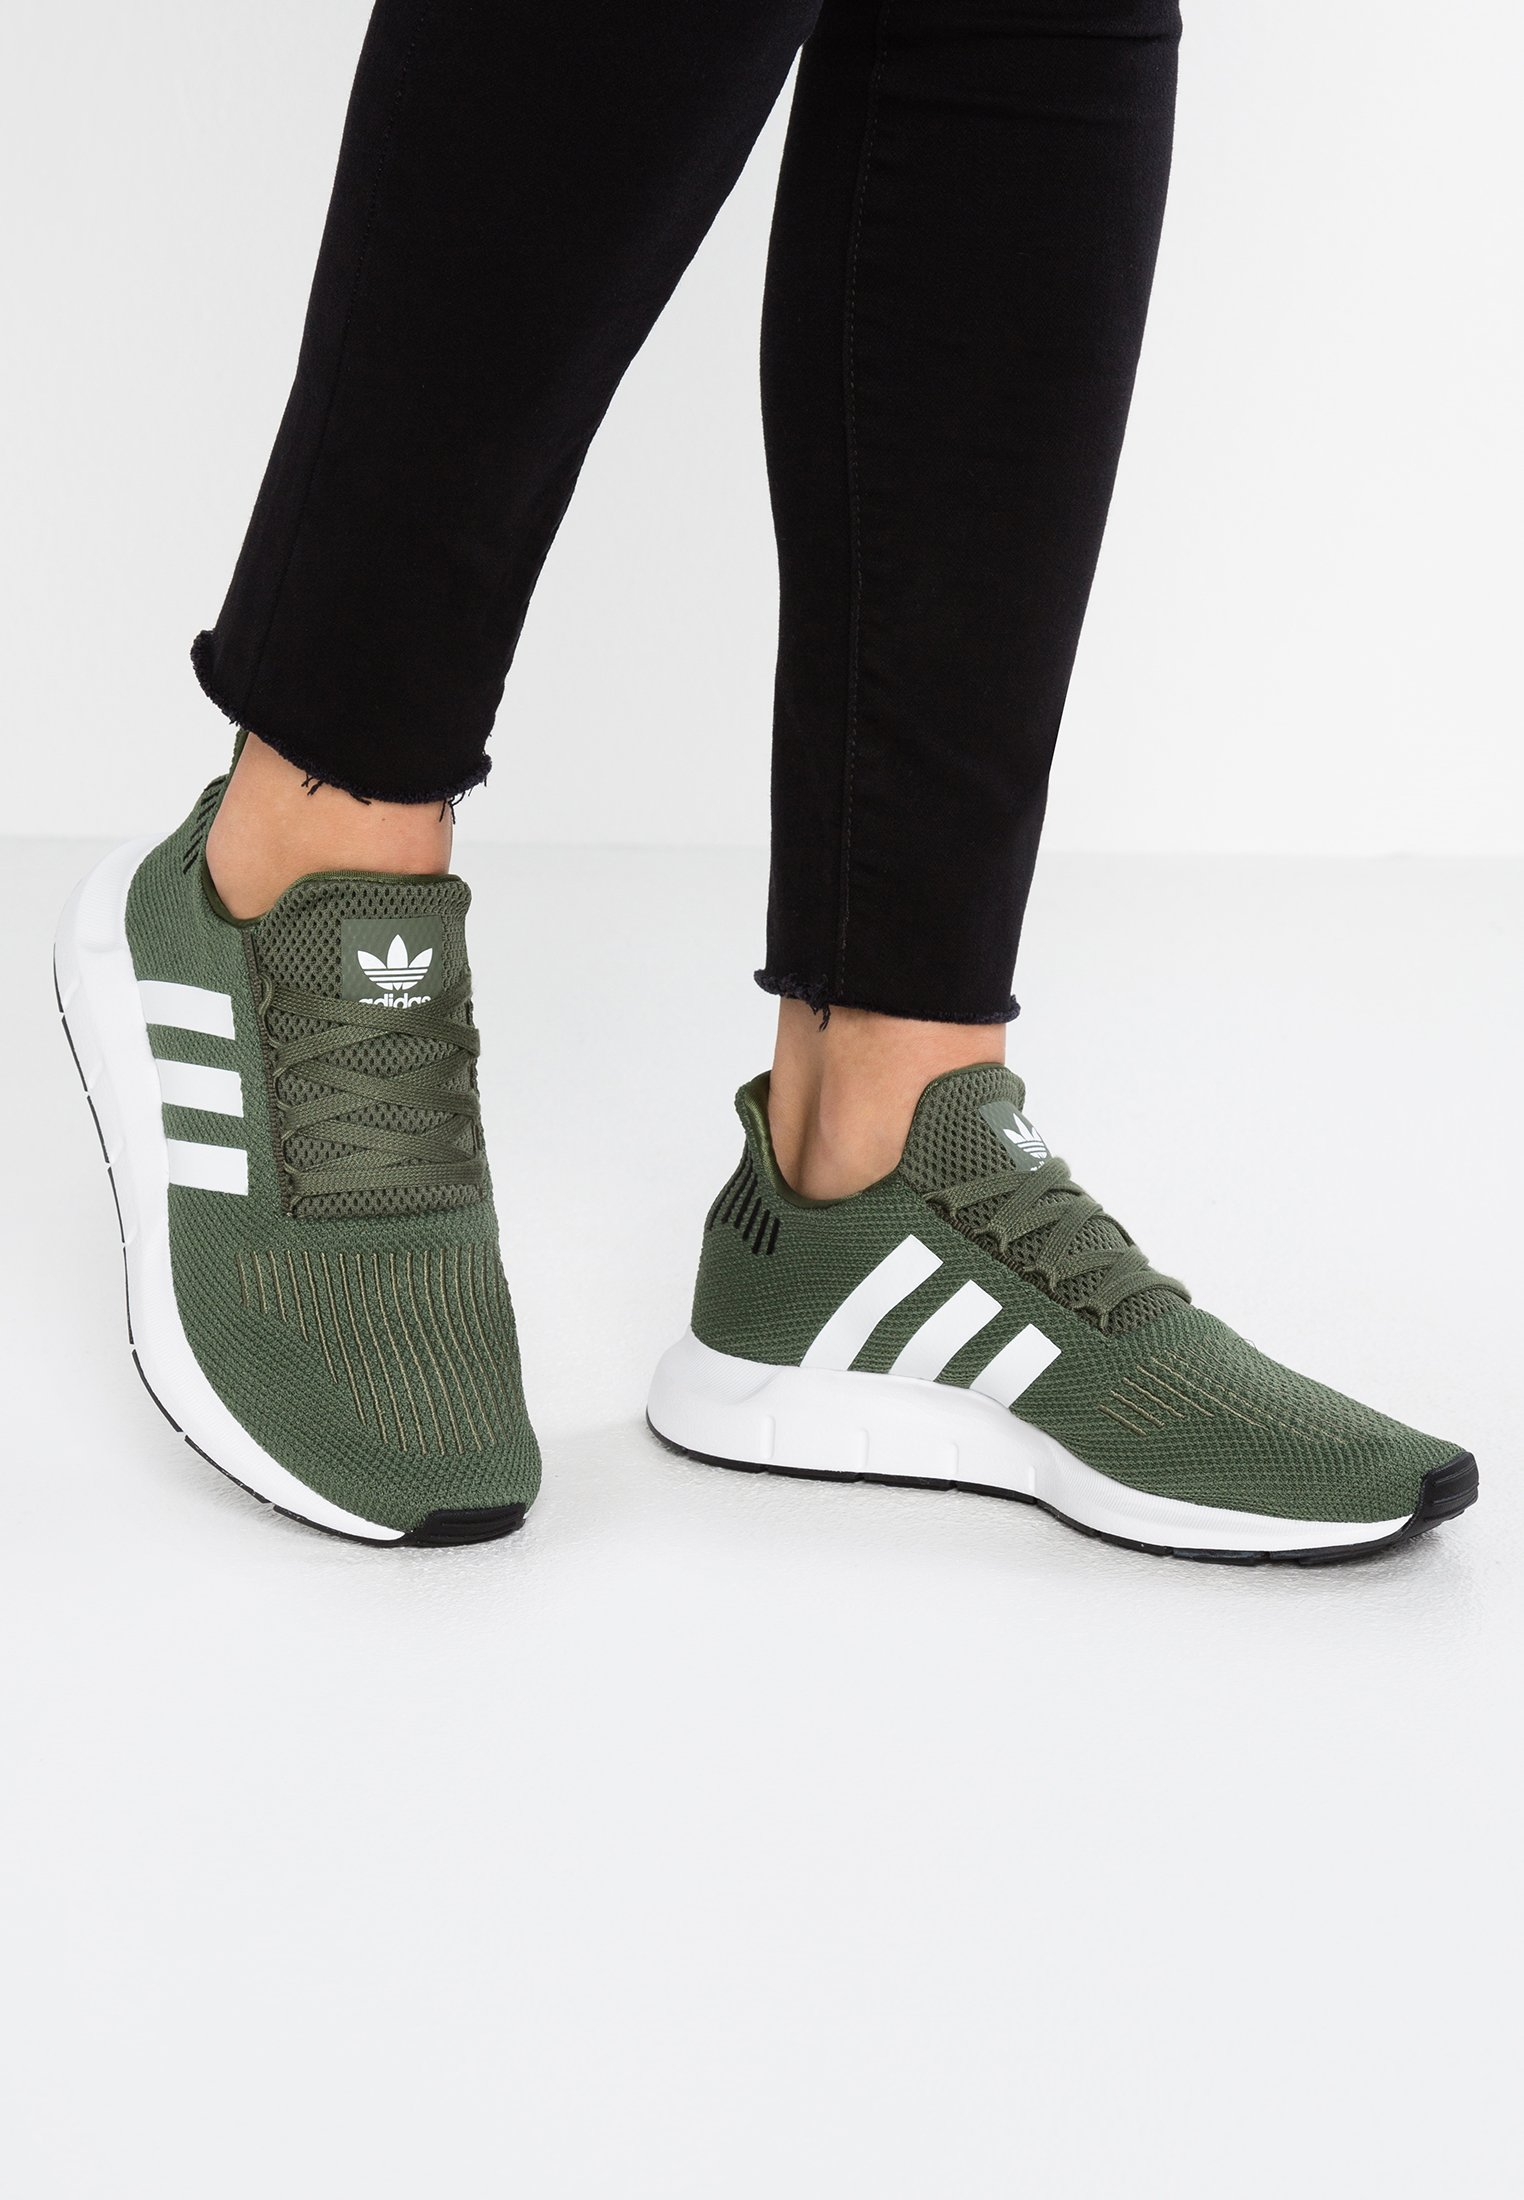 adidas Originals SWIFT RUN Sneakers base greenfootwear